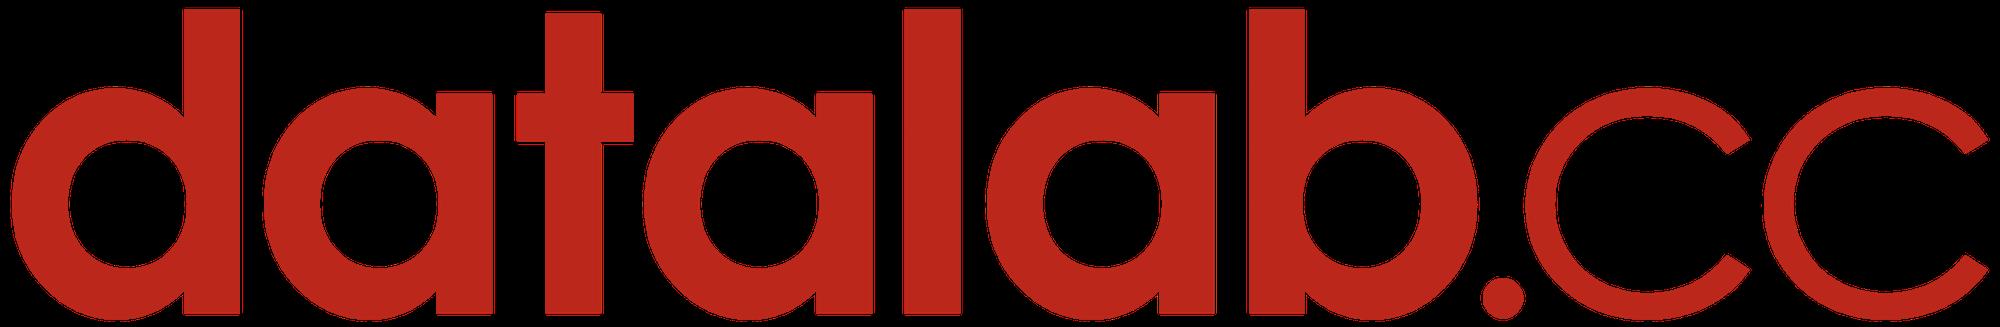 datalab.cc